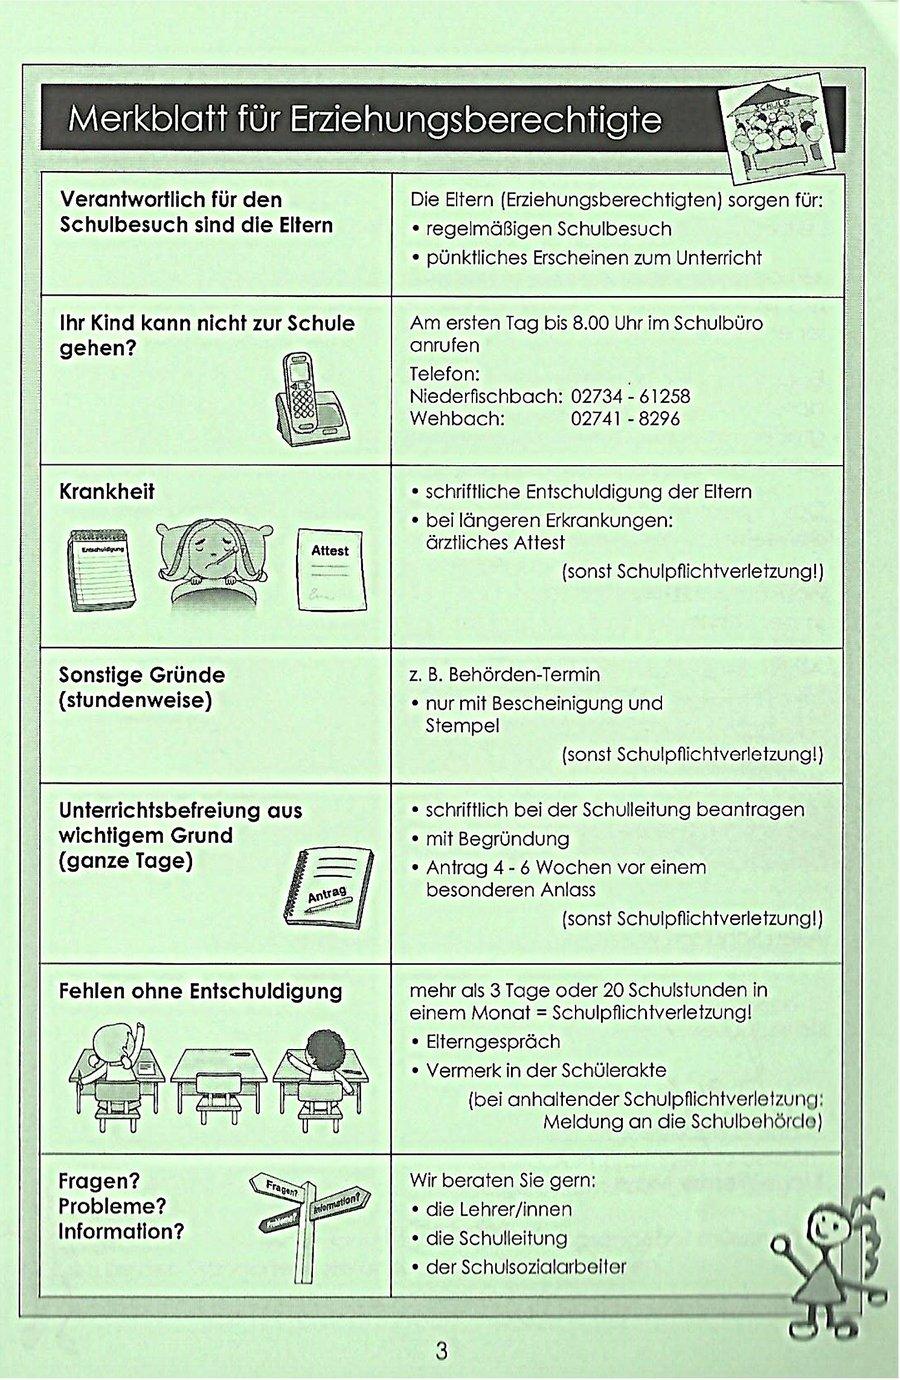 Merkblatt für Erziehungsberechtigte